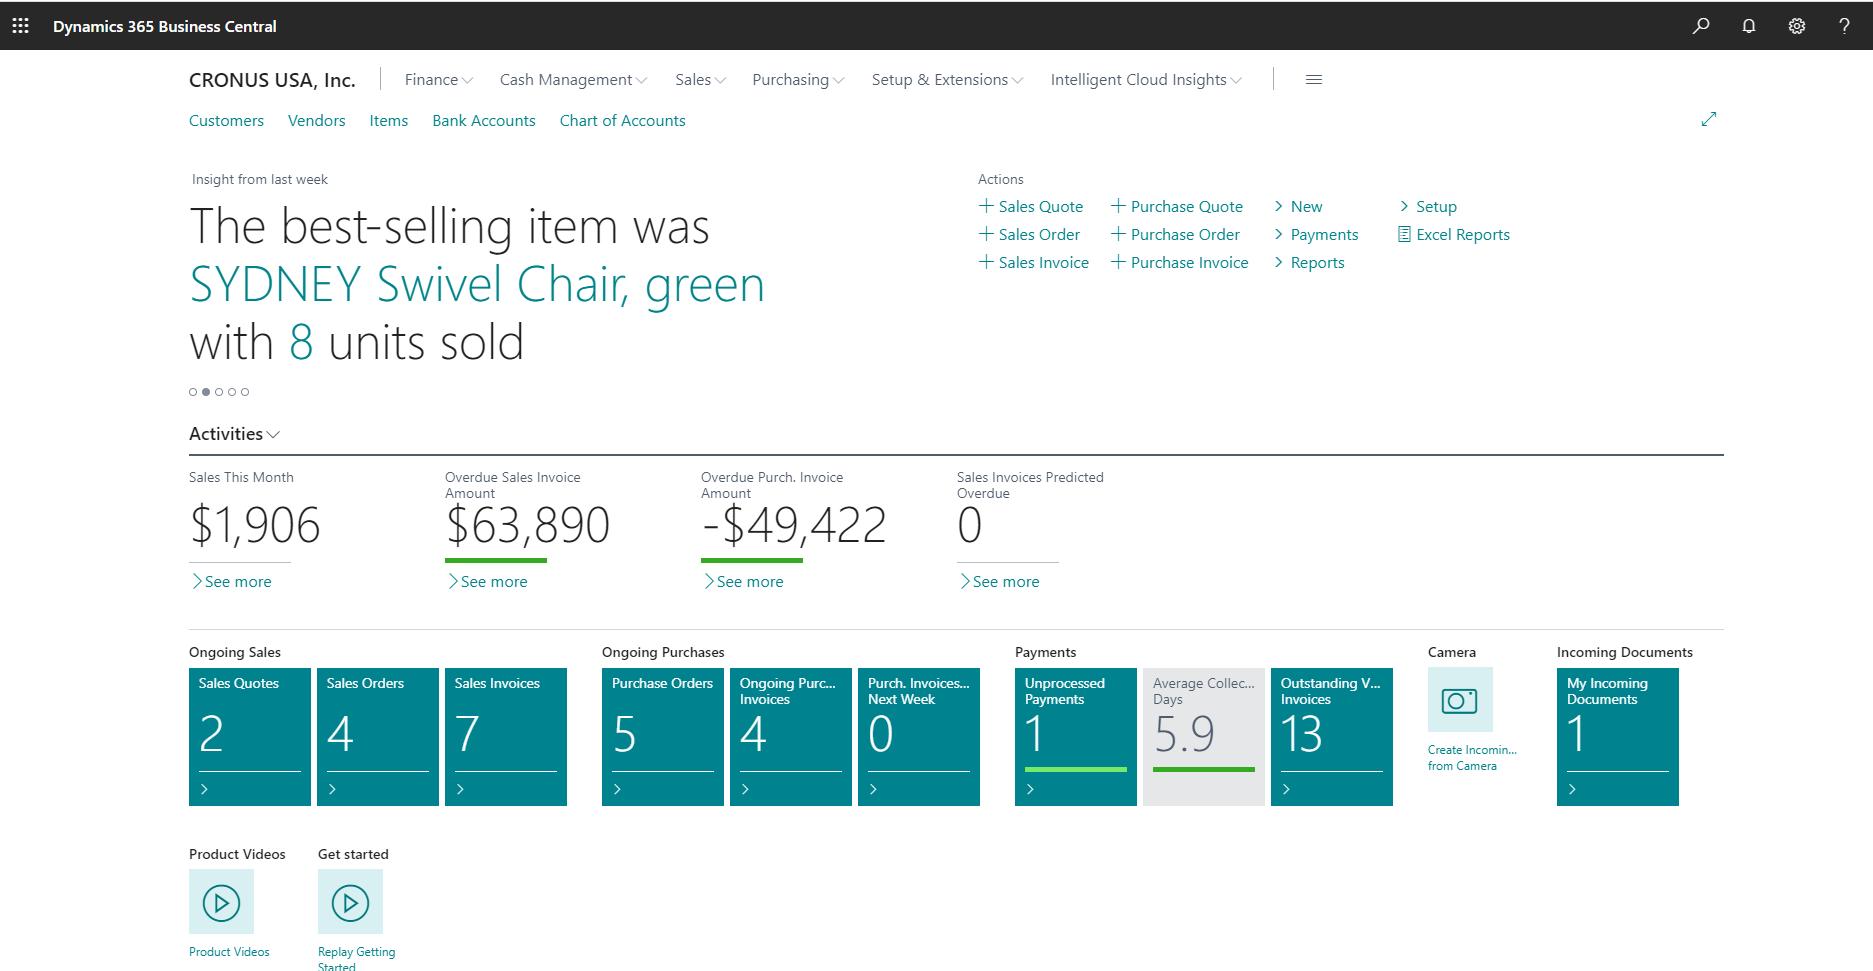 Annovix Microsoft Dynamics 365 Sales